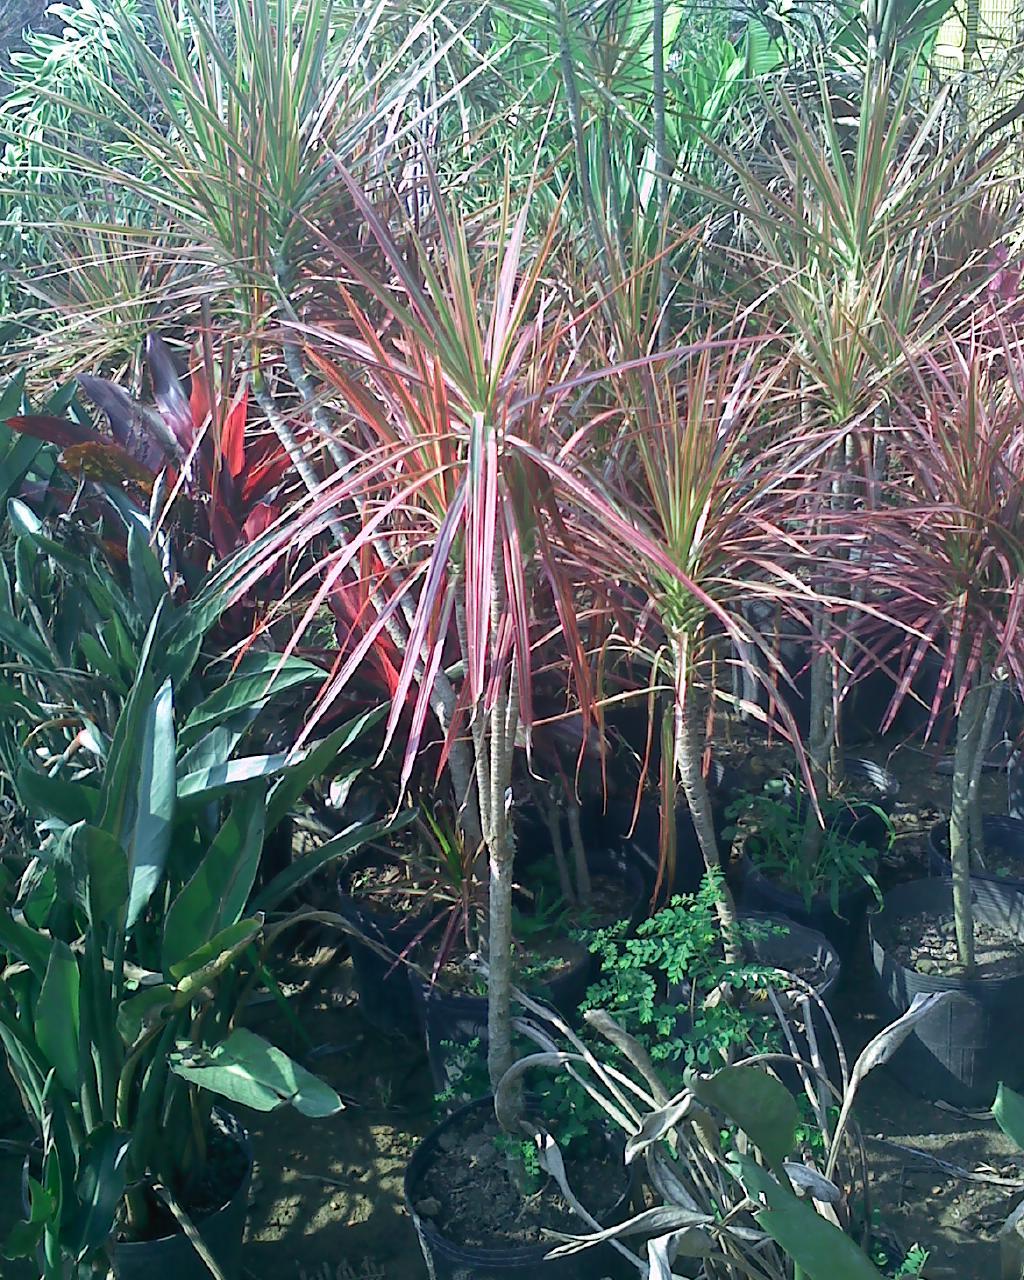 Paisagismo e floricultura plantas de sol - Plantas pleno sol ...